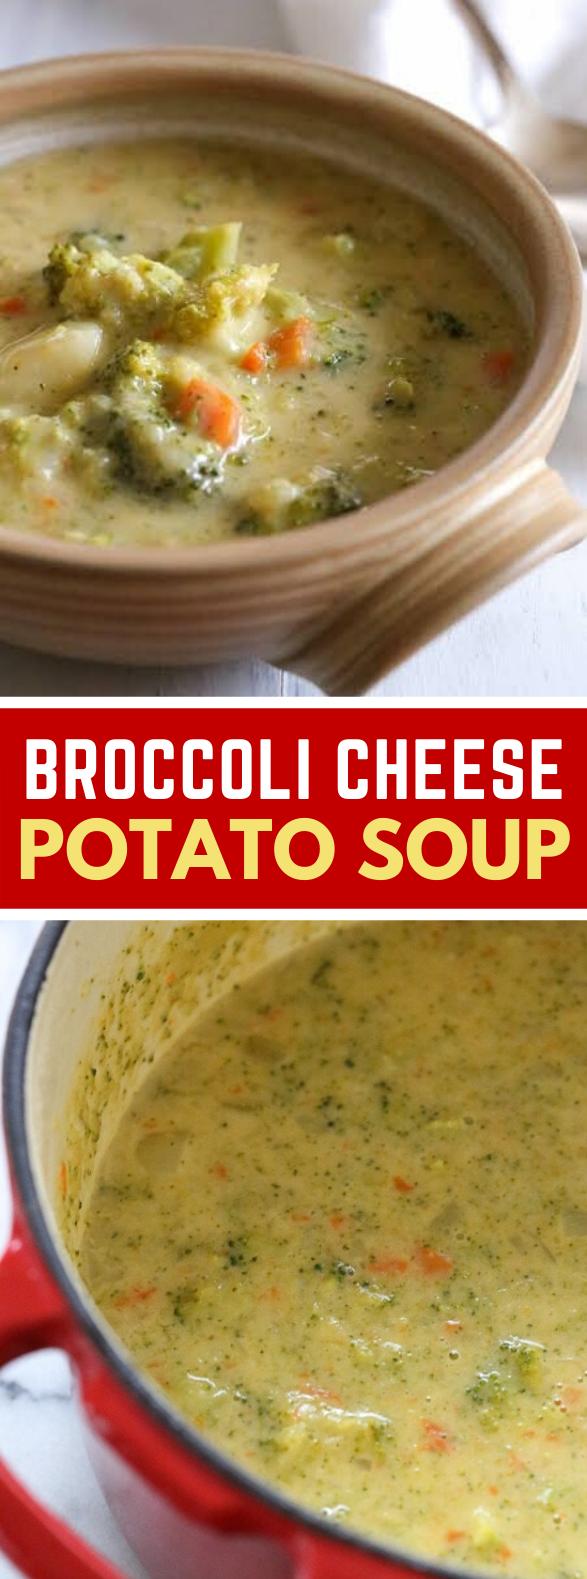 BROCCOLI CHEESE AND POTATO SOUP #vegetarian #healthy